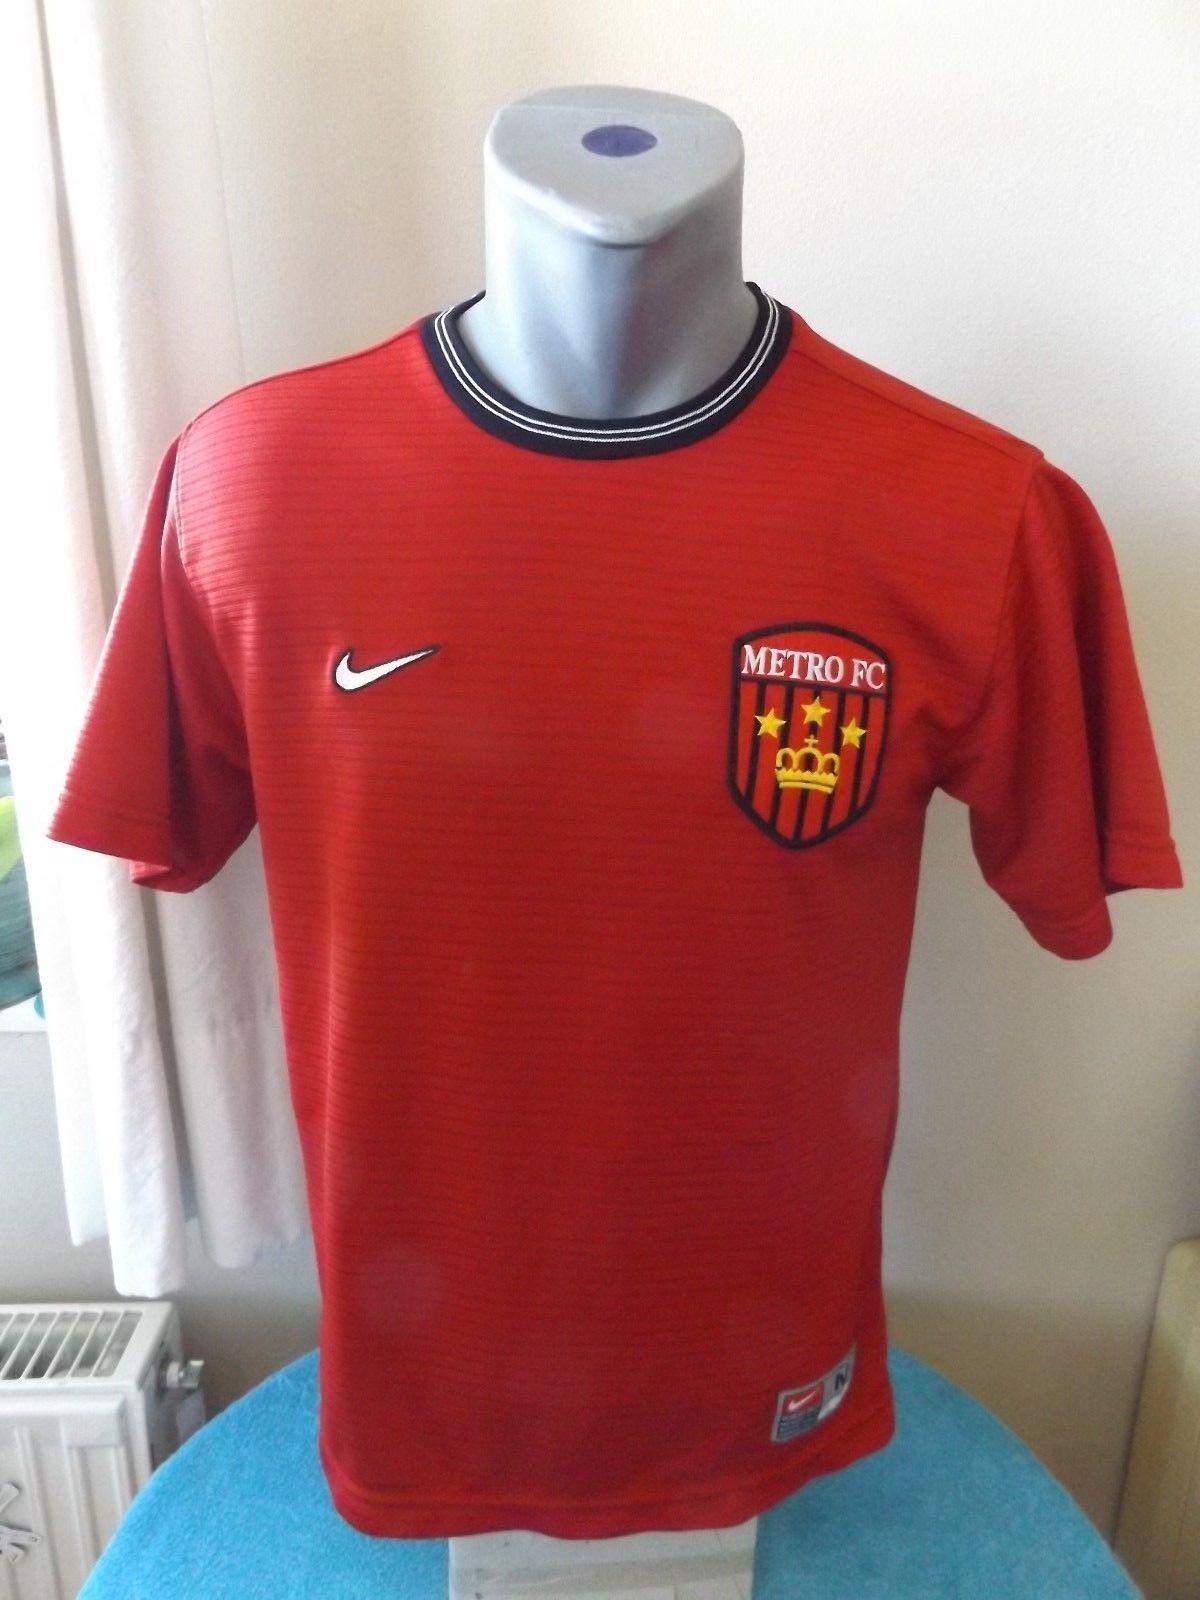 Details about MILLWALL FC 2015 16 Away  9 Soccer Jersey Football ... a024d5284